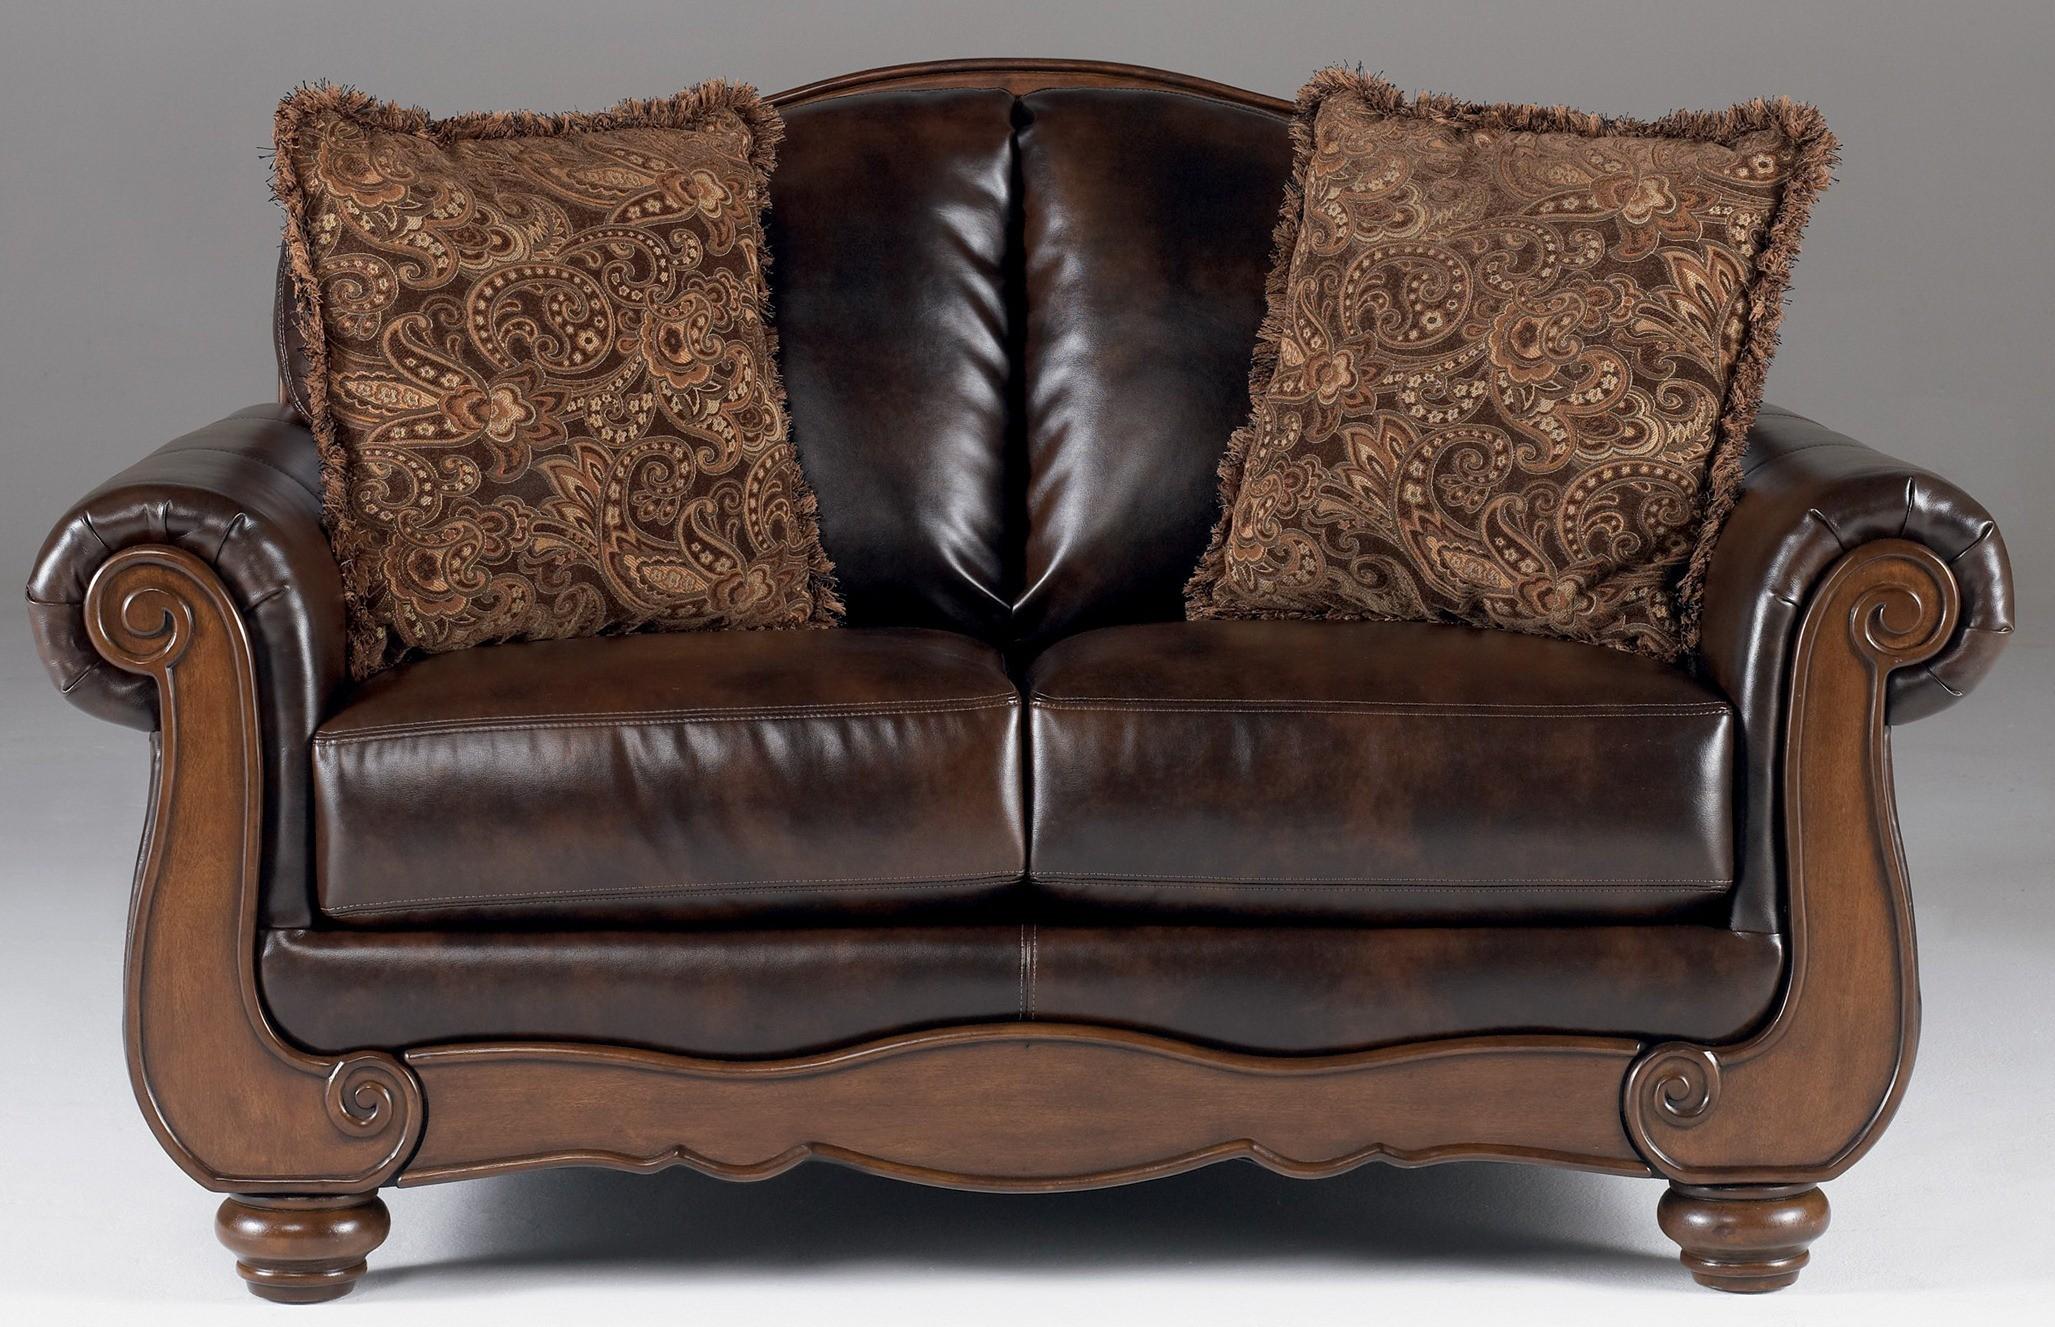 sofa ashley barcelona 2 cuerpos bangalore antique living room set from 55300